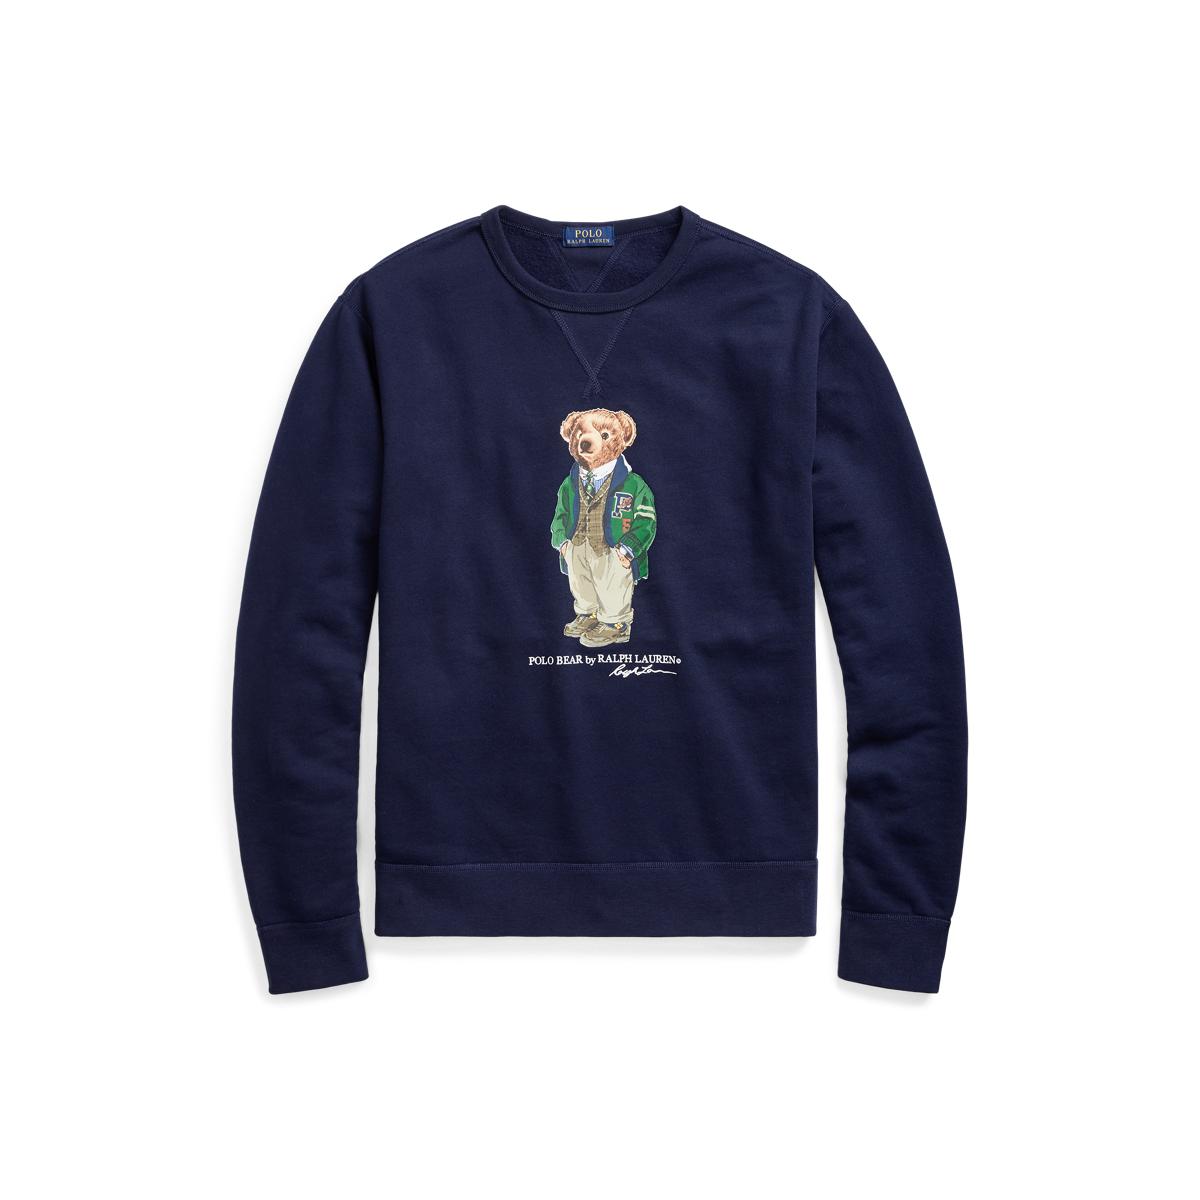 057f0785b8a49 Polo Bear Fleece Sweatshirt